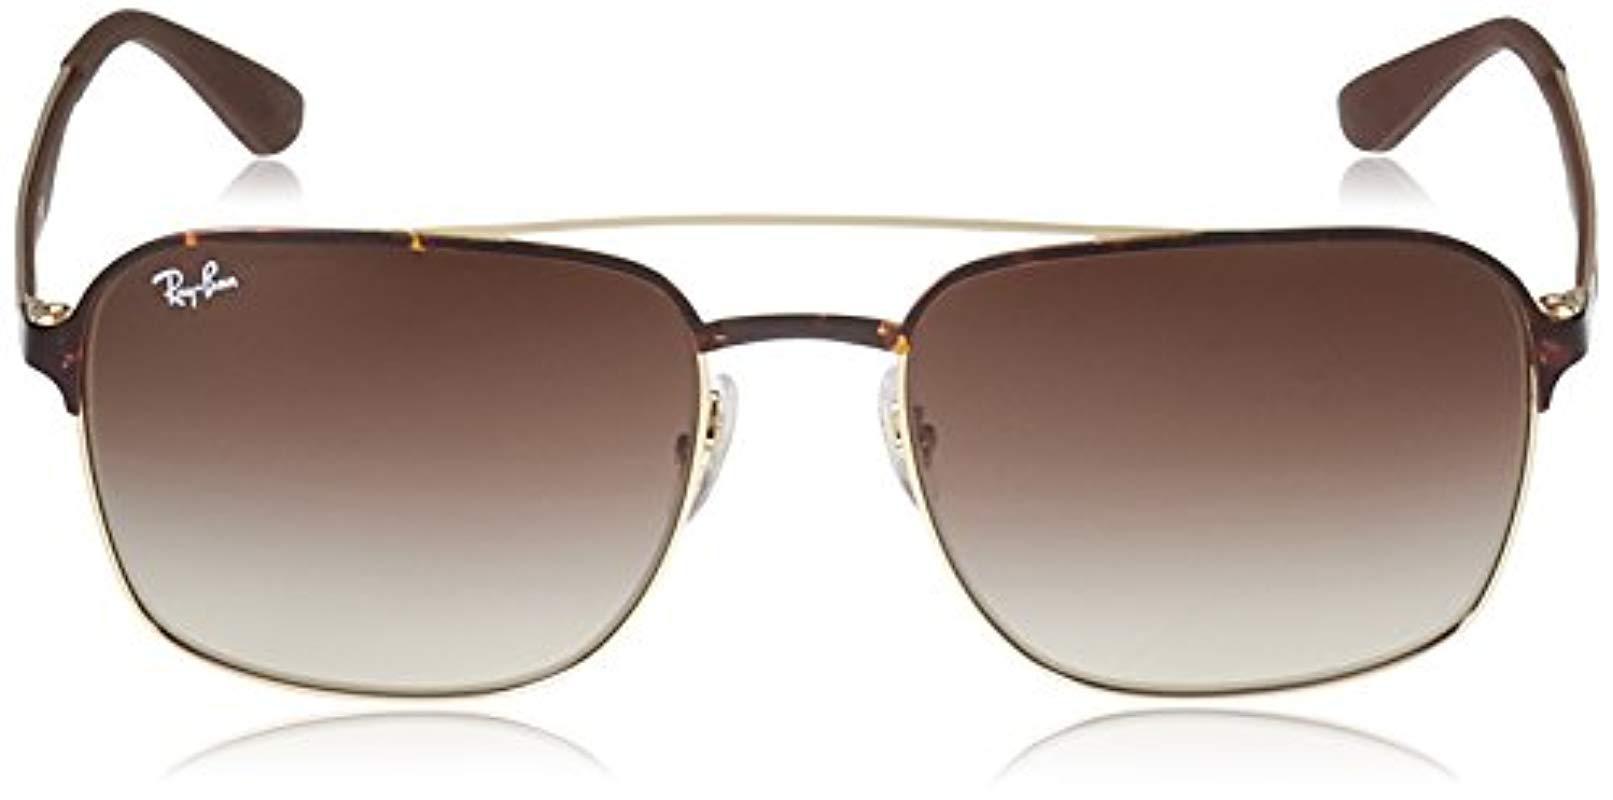 58 de Negro sol Gafas de Adultos 3570 Rayban Unisex 8SnazwUax